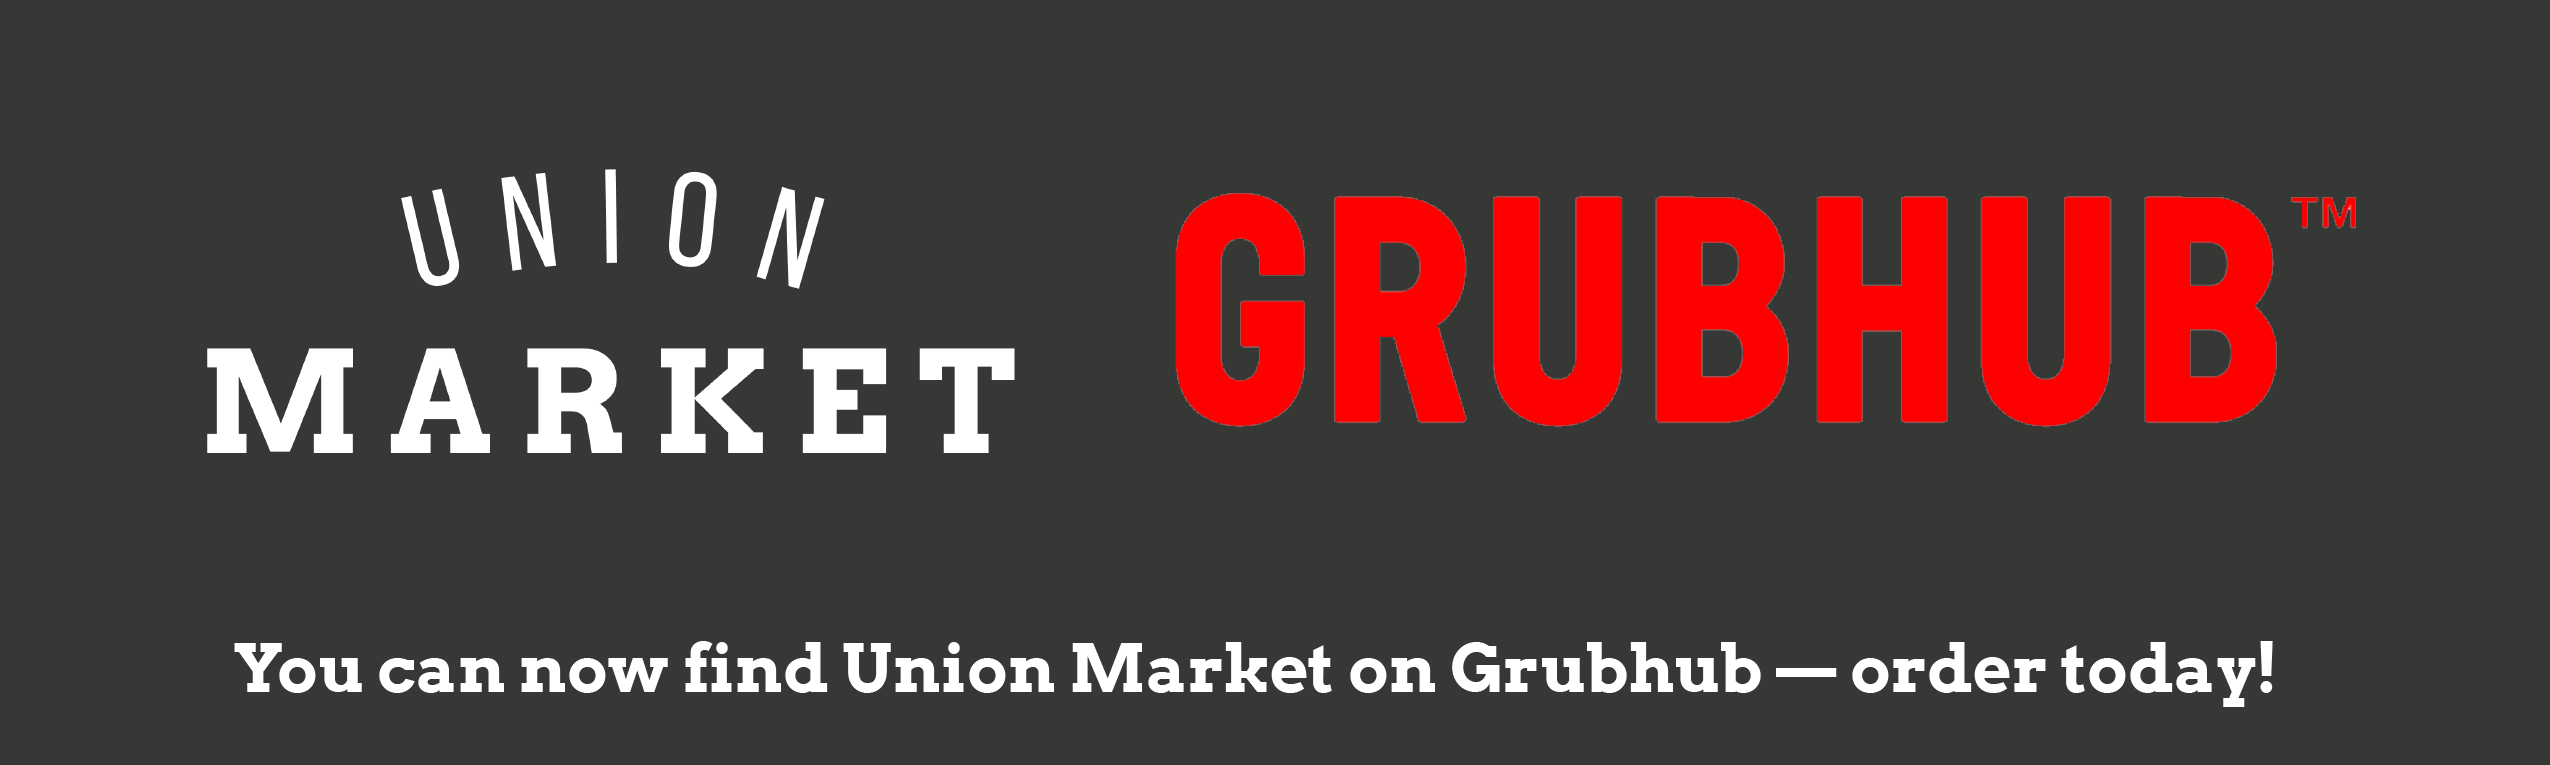 Union Market is on Grubhub